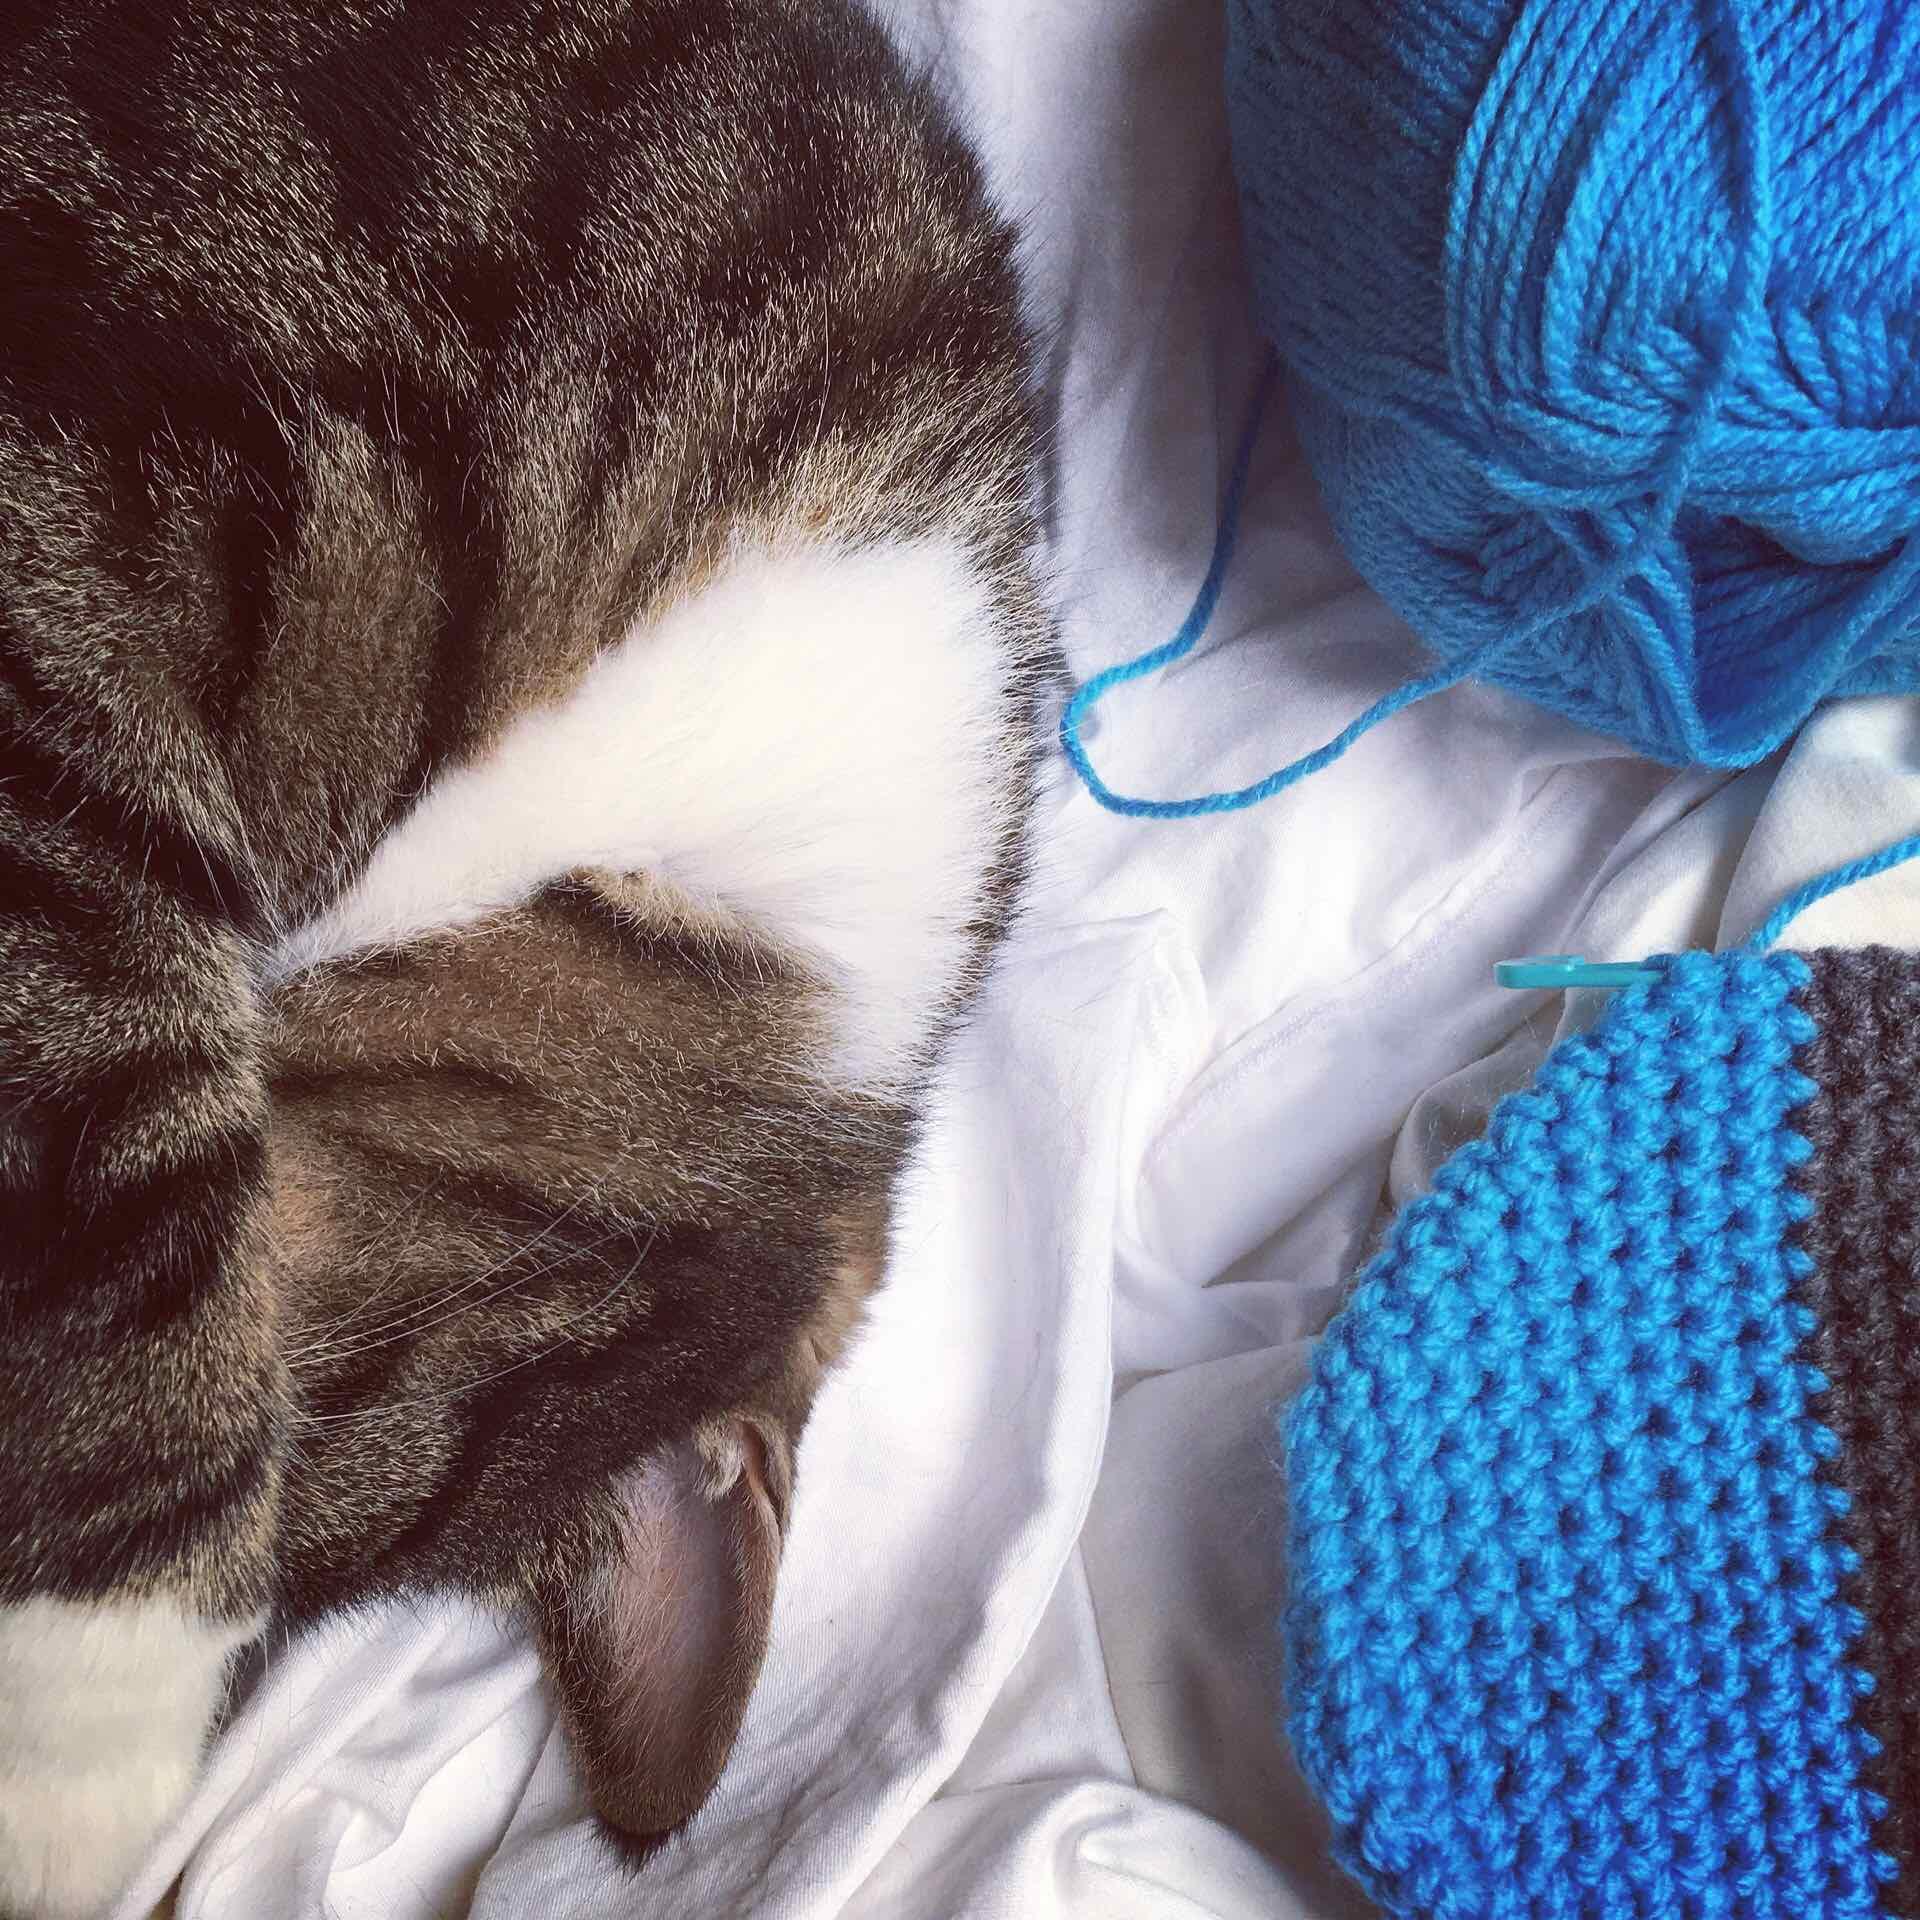 Crocheting with Bailey